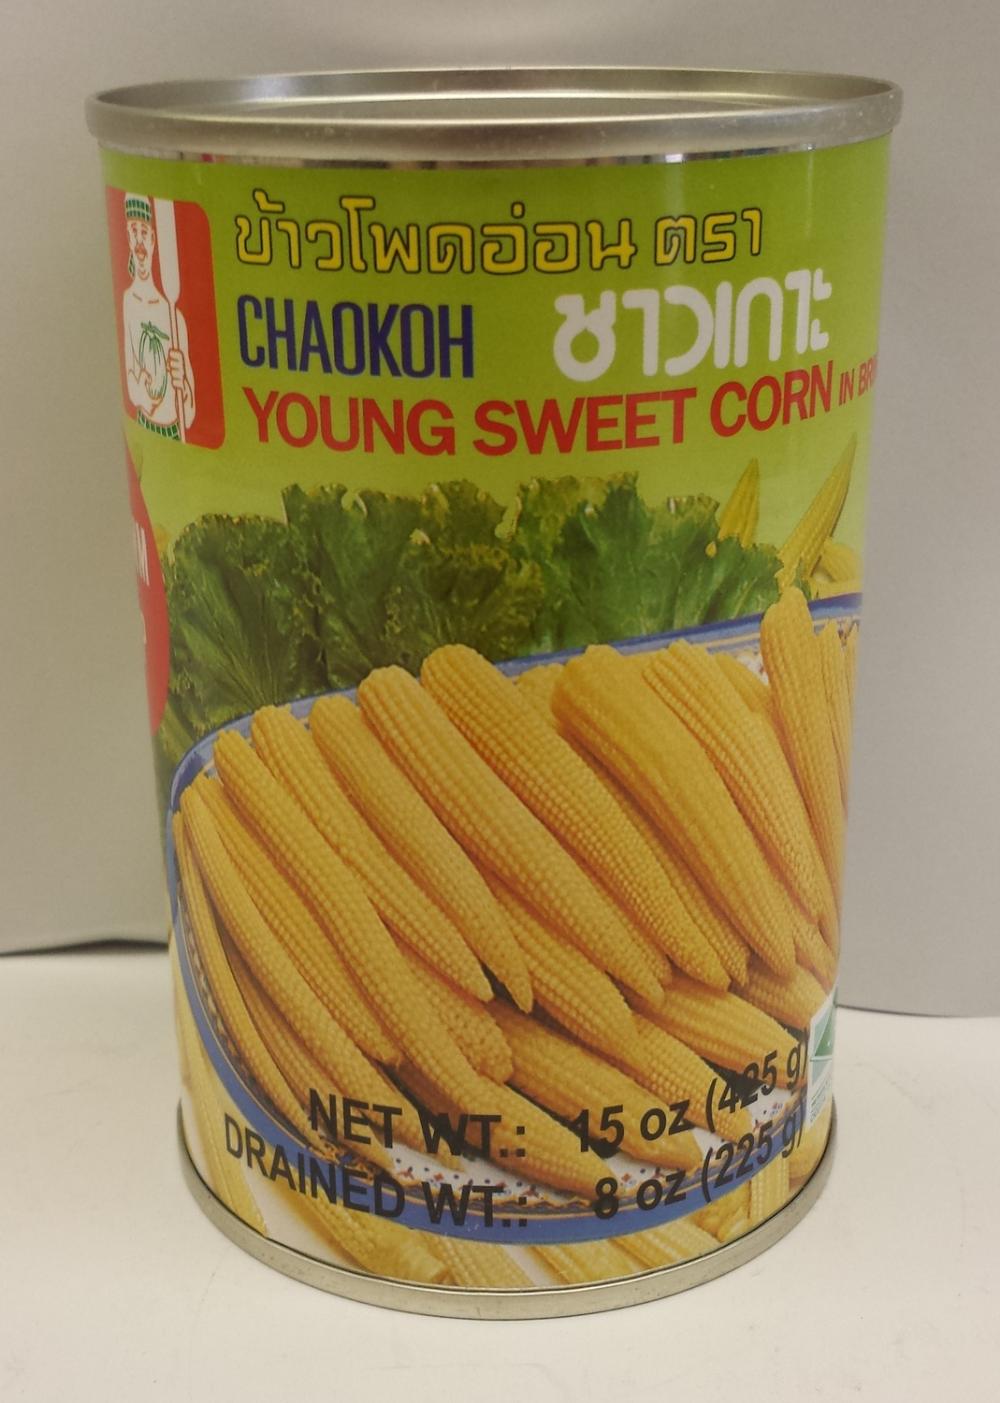 Young Sweet Corn    Chaokoh   VC19119 24x15 oz